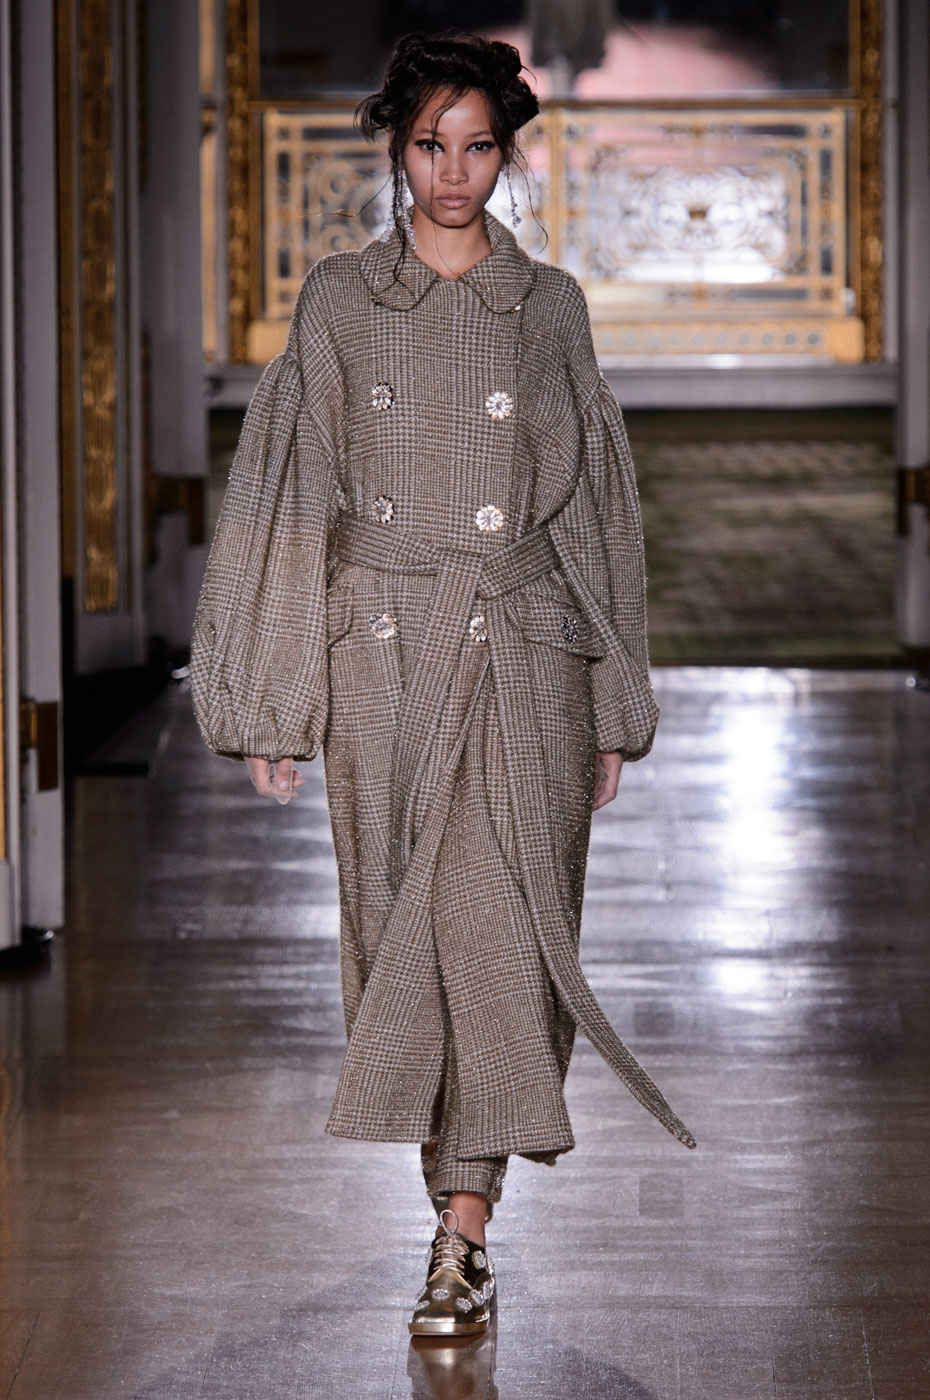 London Fashion Week: The 10 Biggest Trends - Fashionista